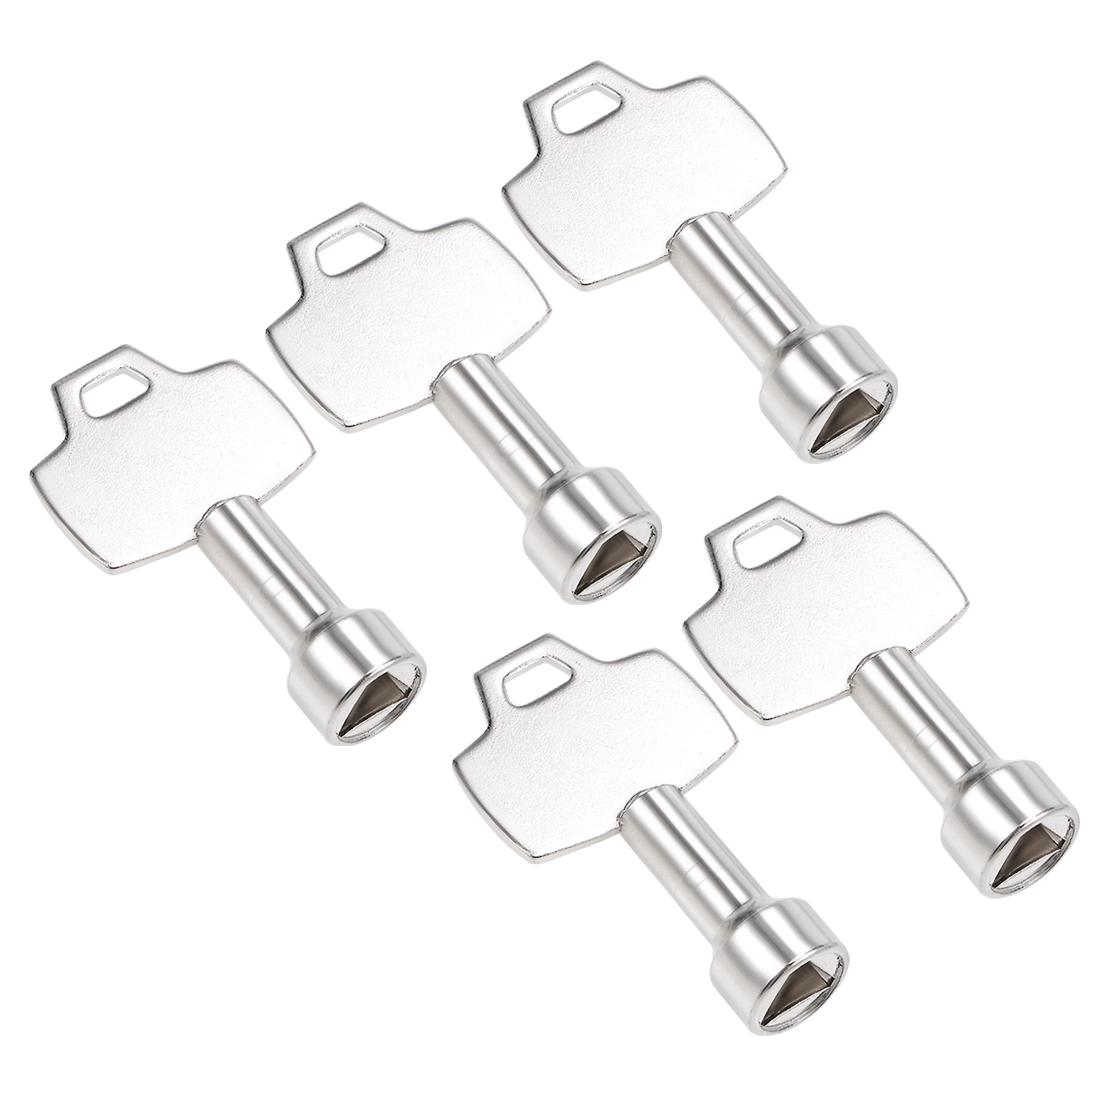 Electrical Cabinet Key 8x1.5mm Zinc Alloy Triangle Water Meter Box Key 5Pcs